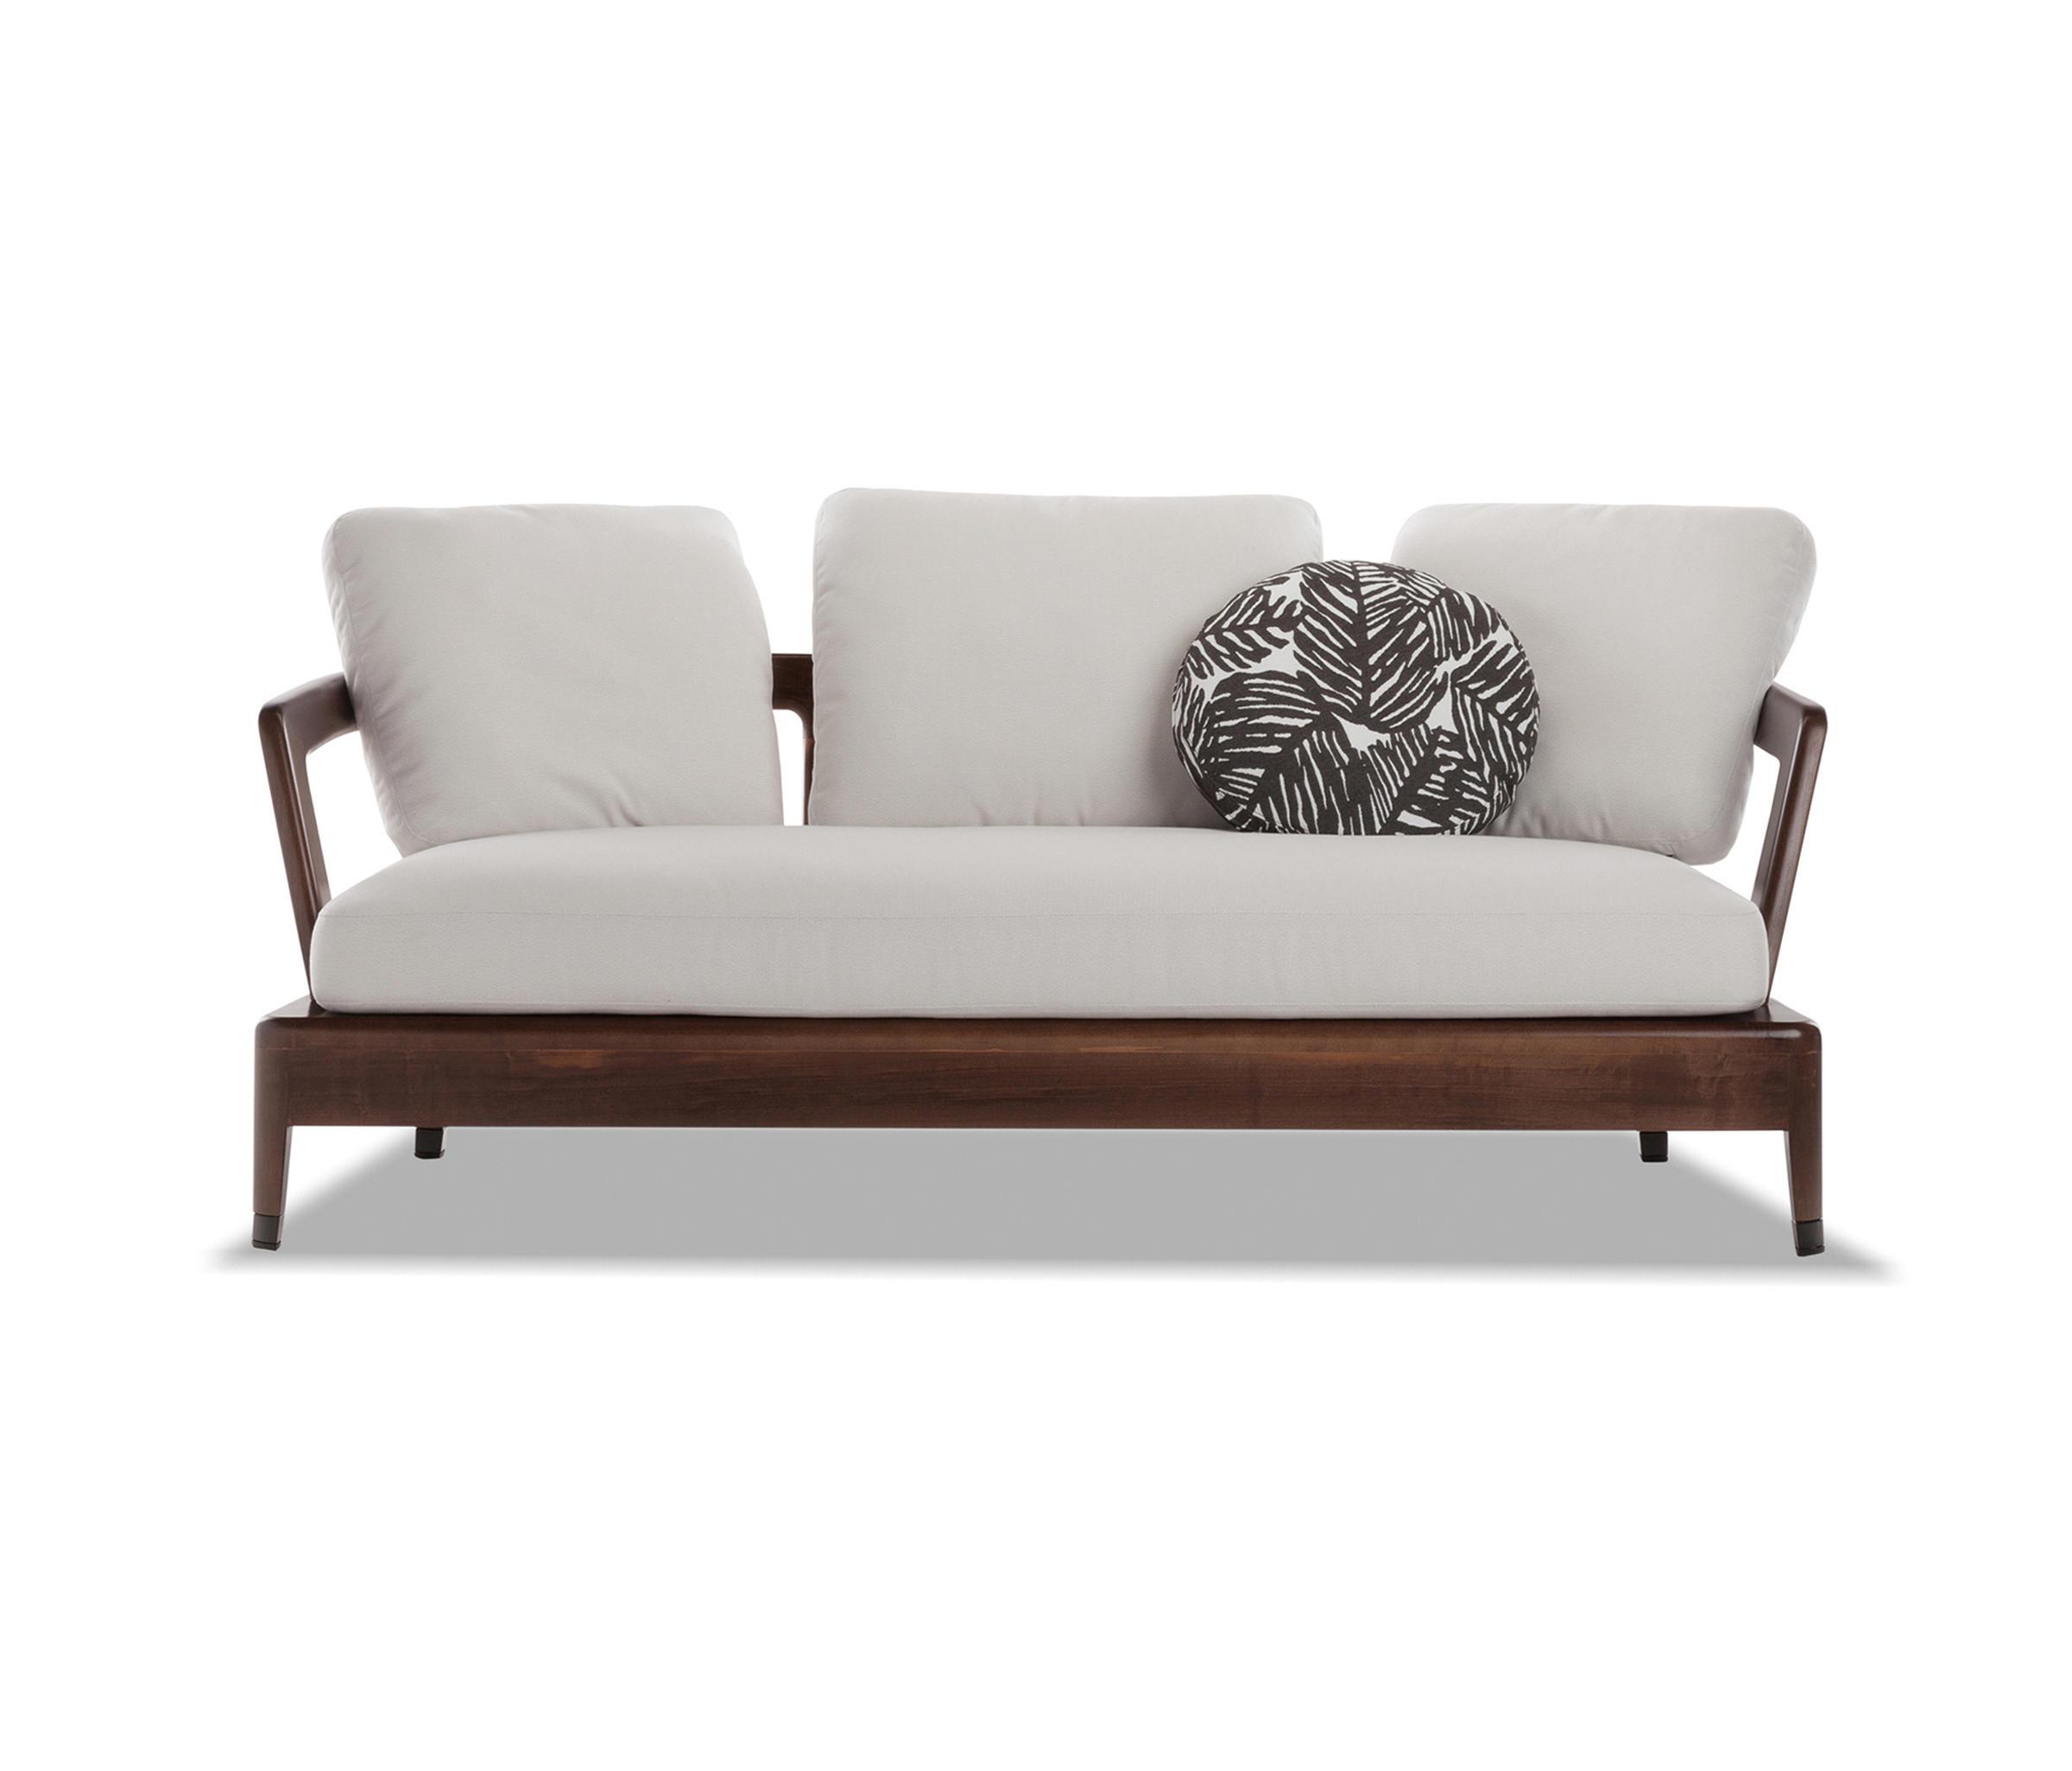 outdoor sofa furniture joss and main sectional virginia coastal clics exotic